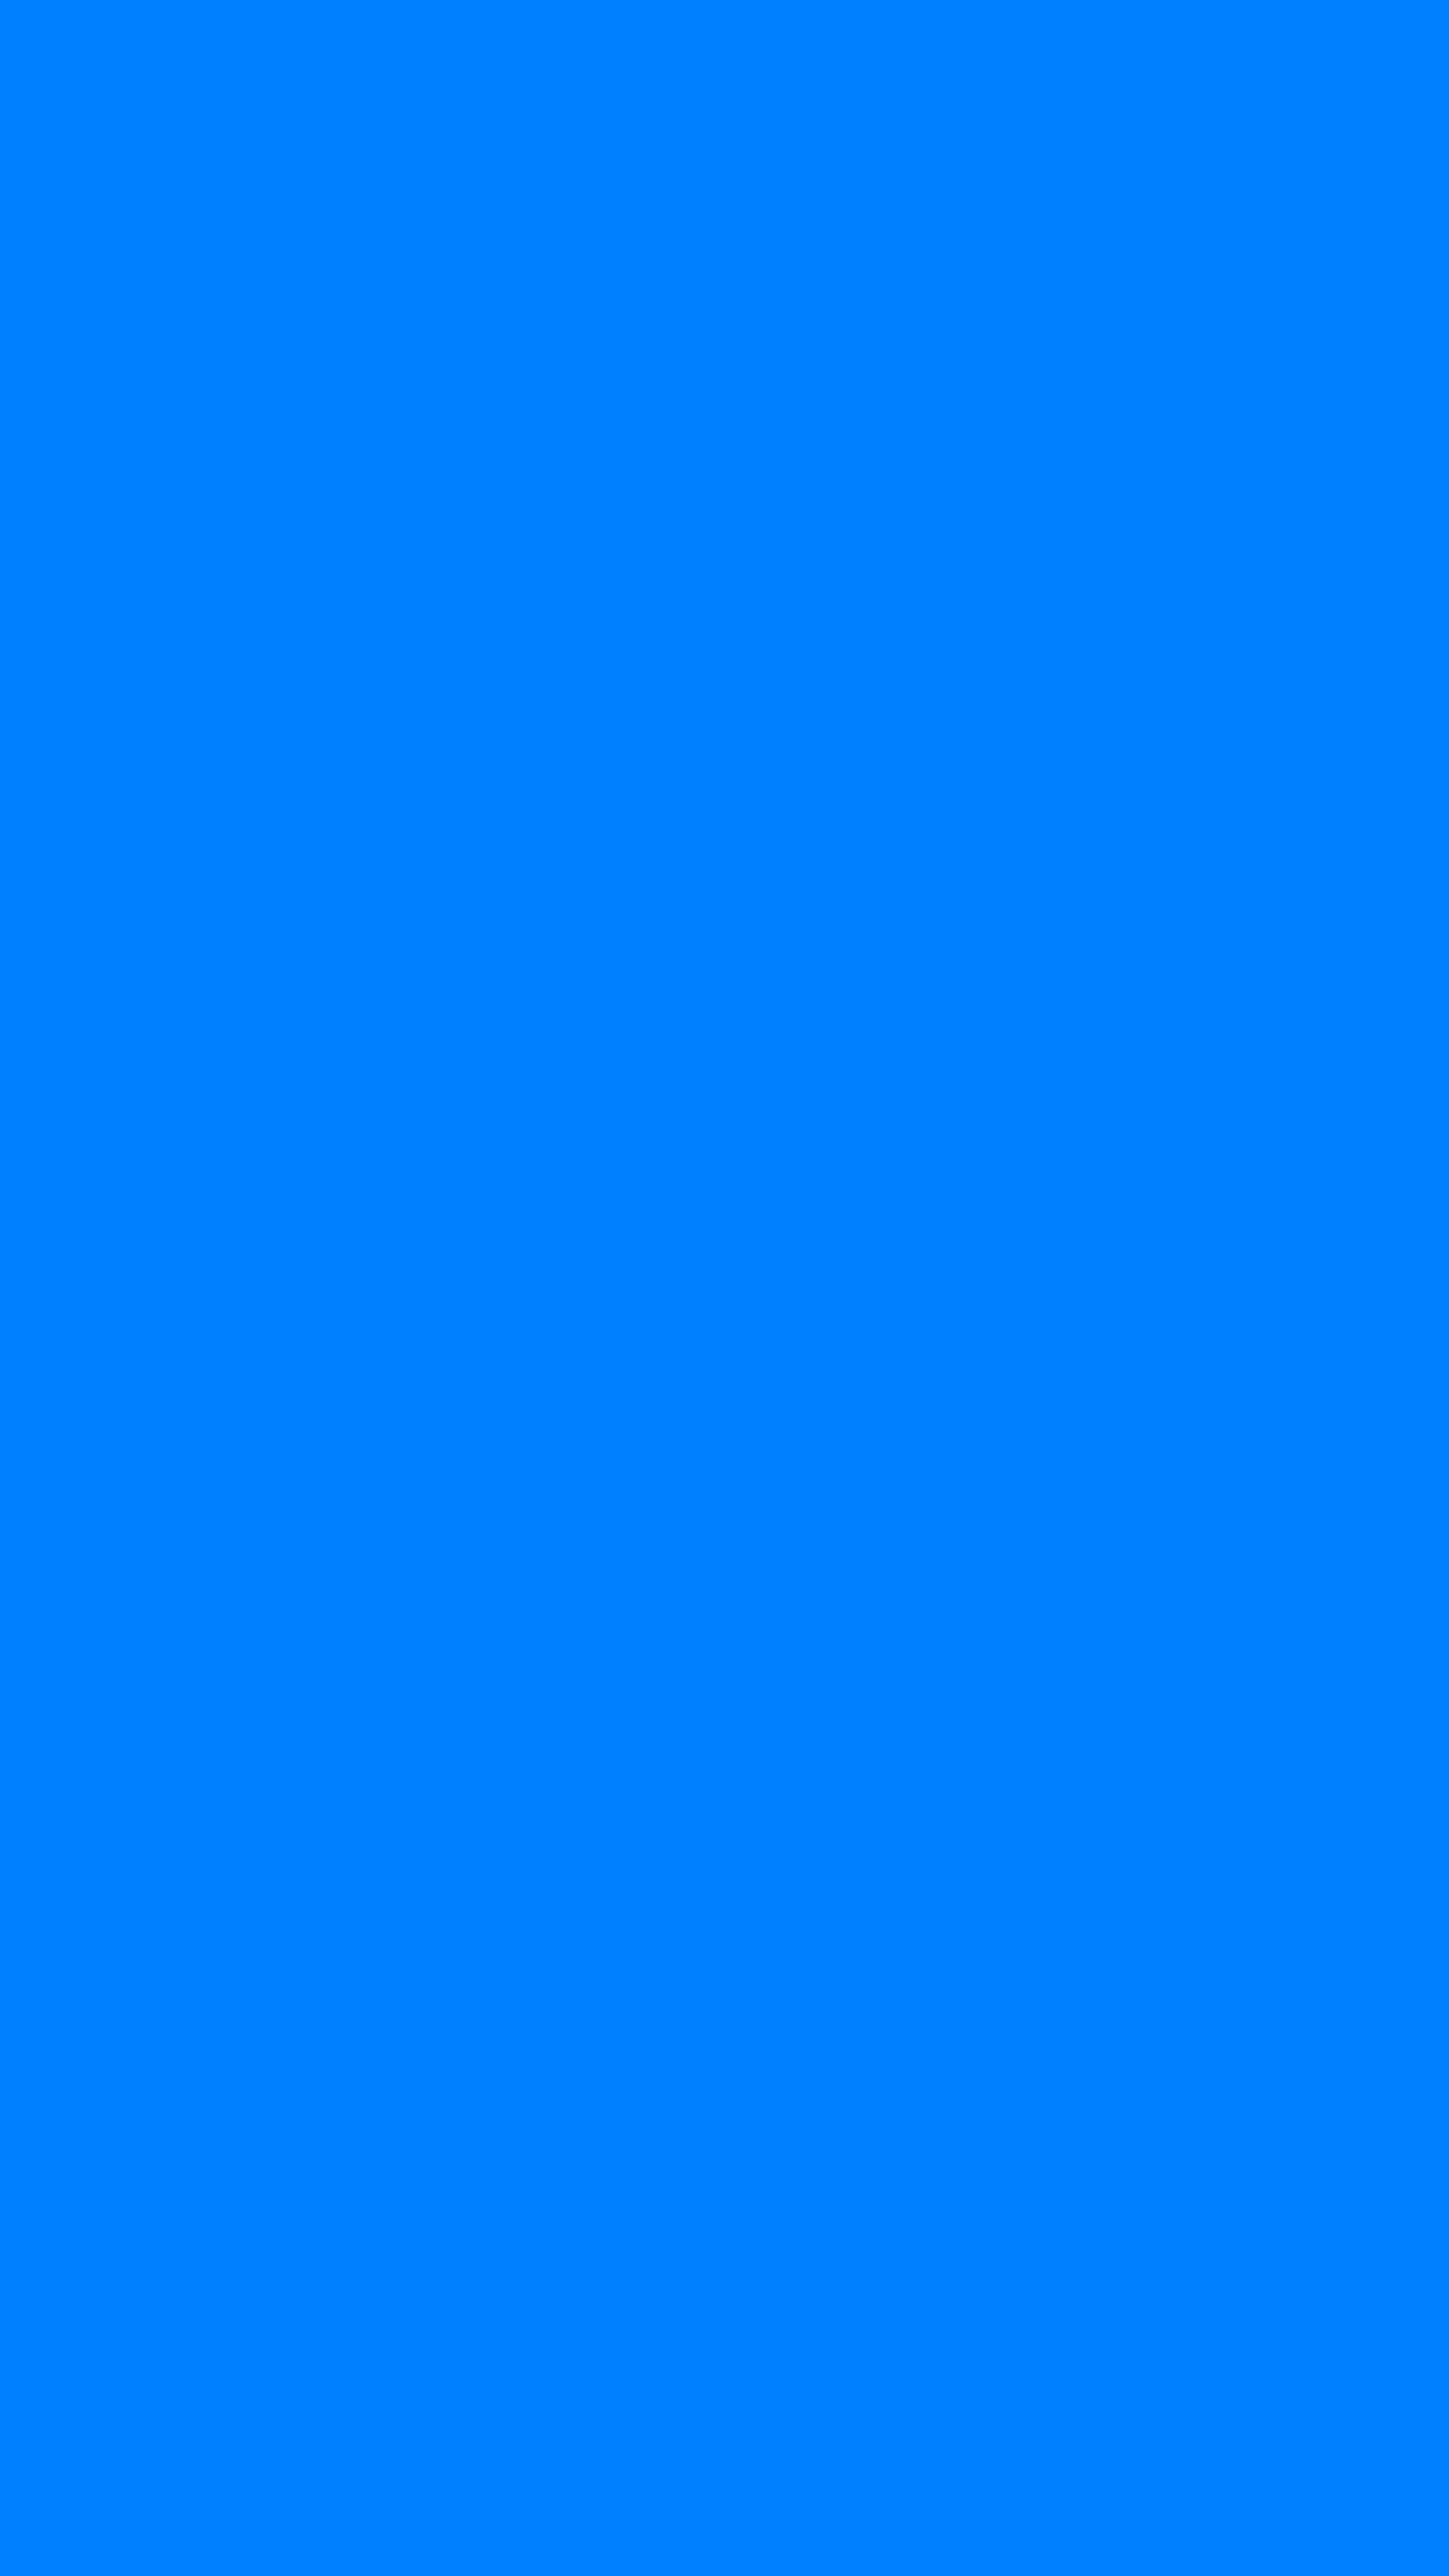 Azure Solid Color Background Wallpaper